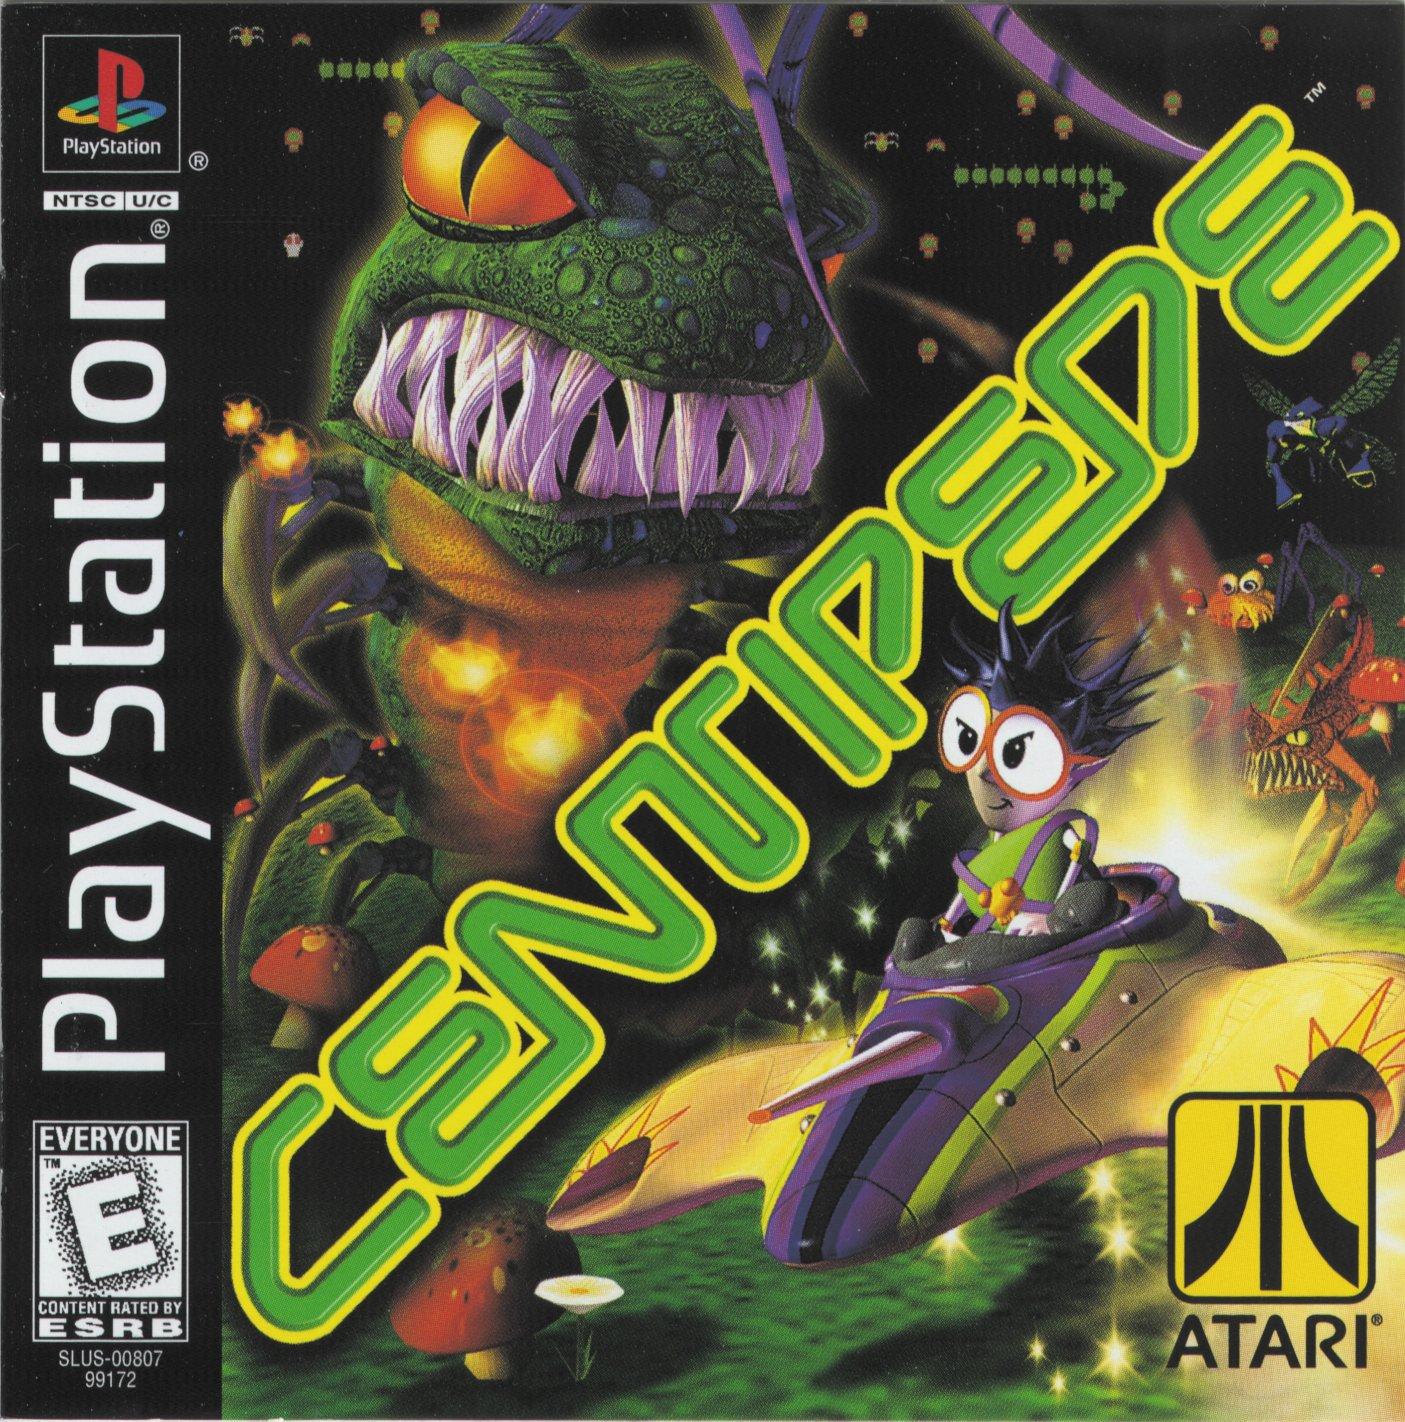 Centipede Slus 00807 Rom Playstation Ps1 Emulator Games